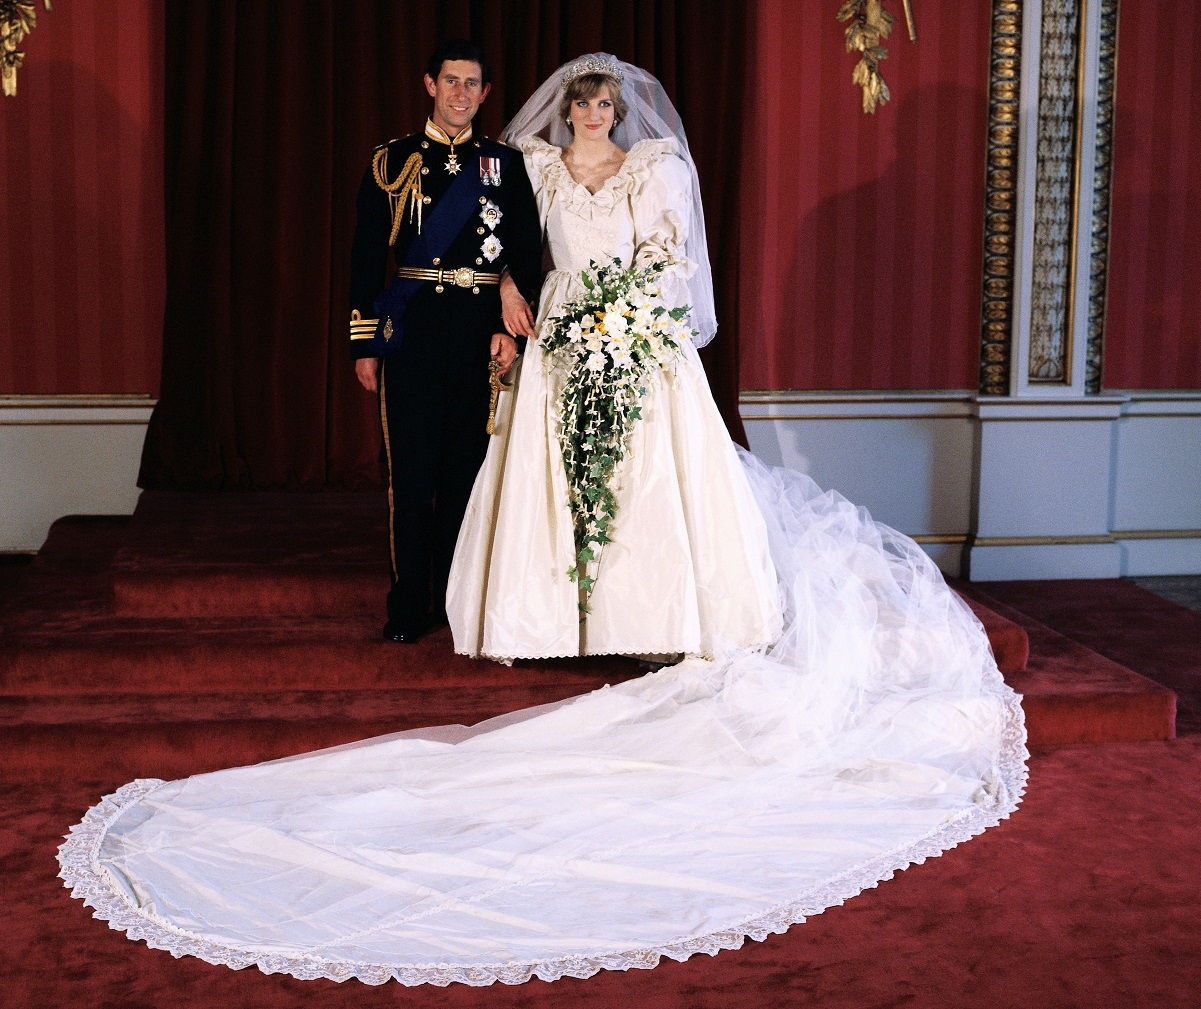 Prince Charles and Princess Diana wedding portrait